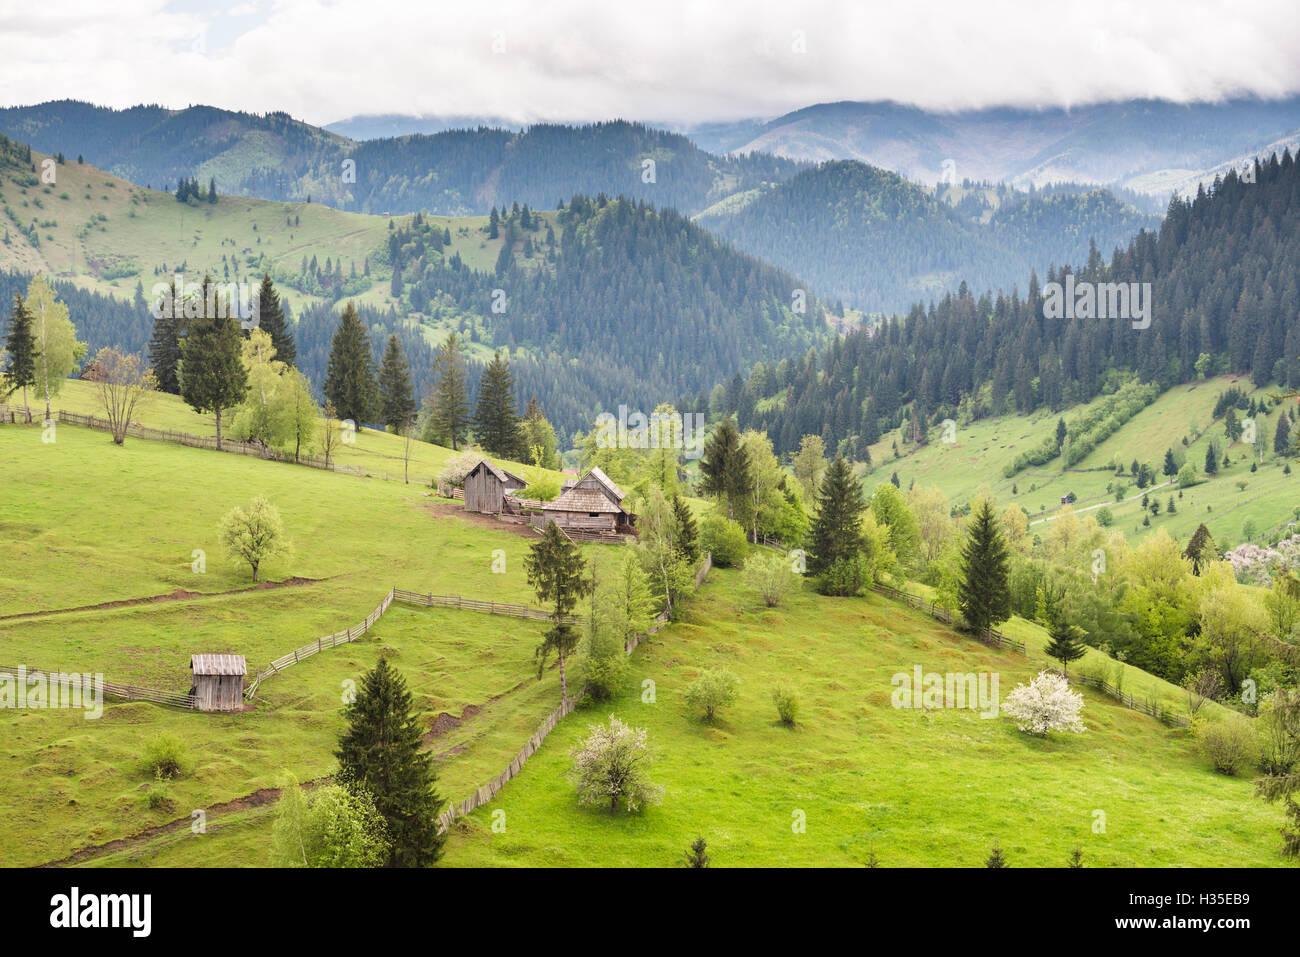 Hilly rural landscape of the Bukovina Region at Sadova, Romania - Stock Image